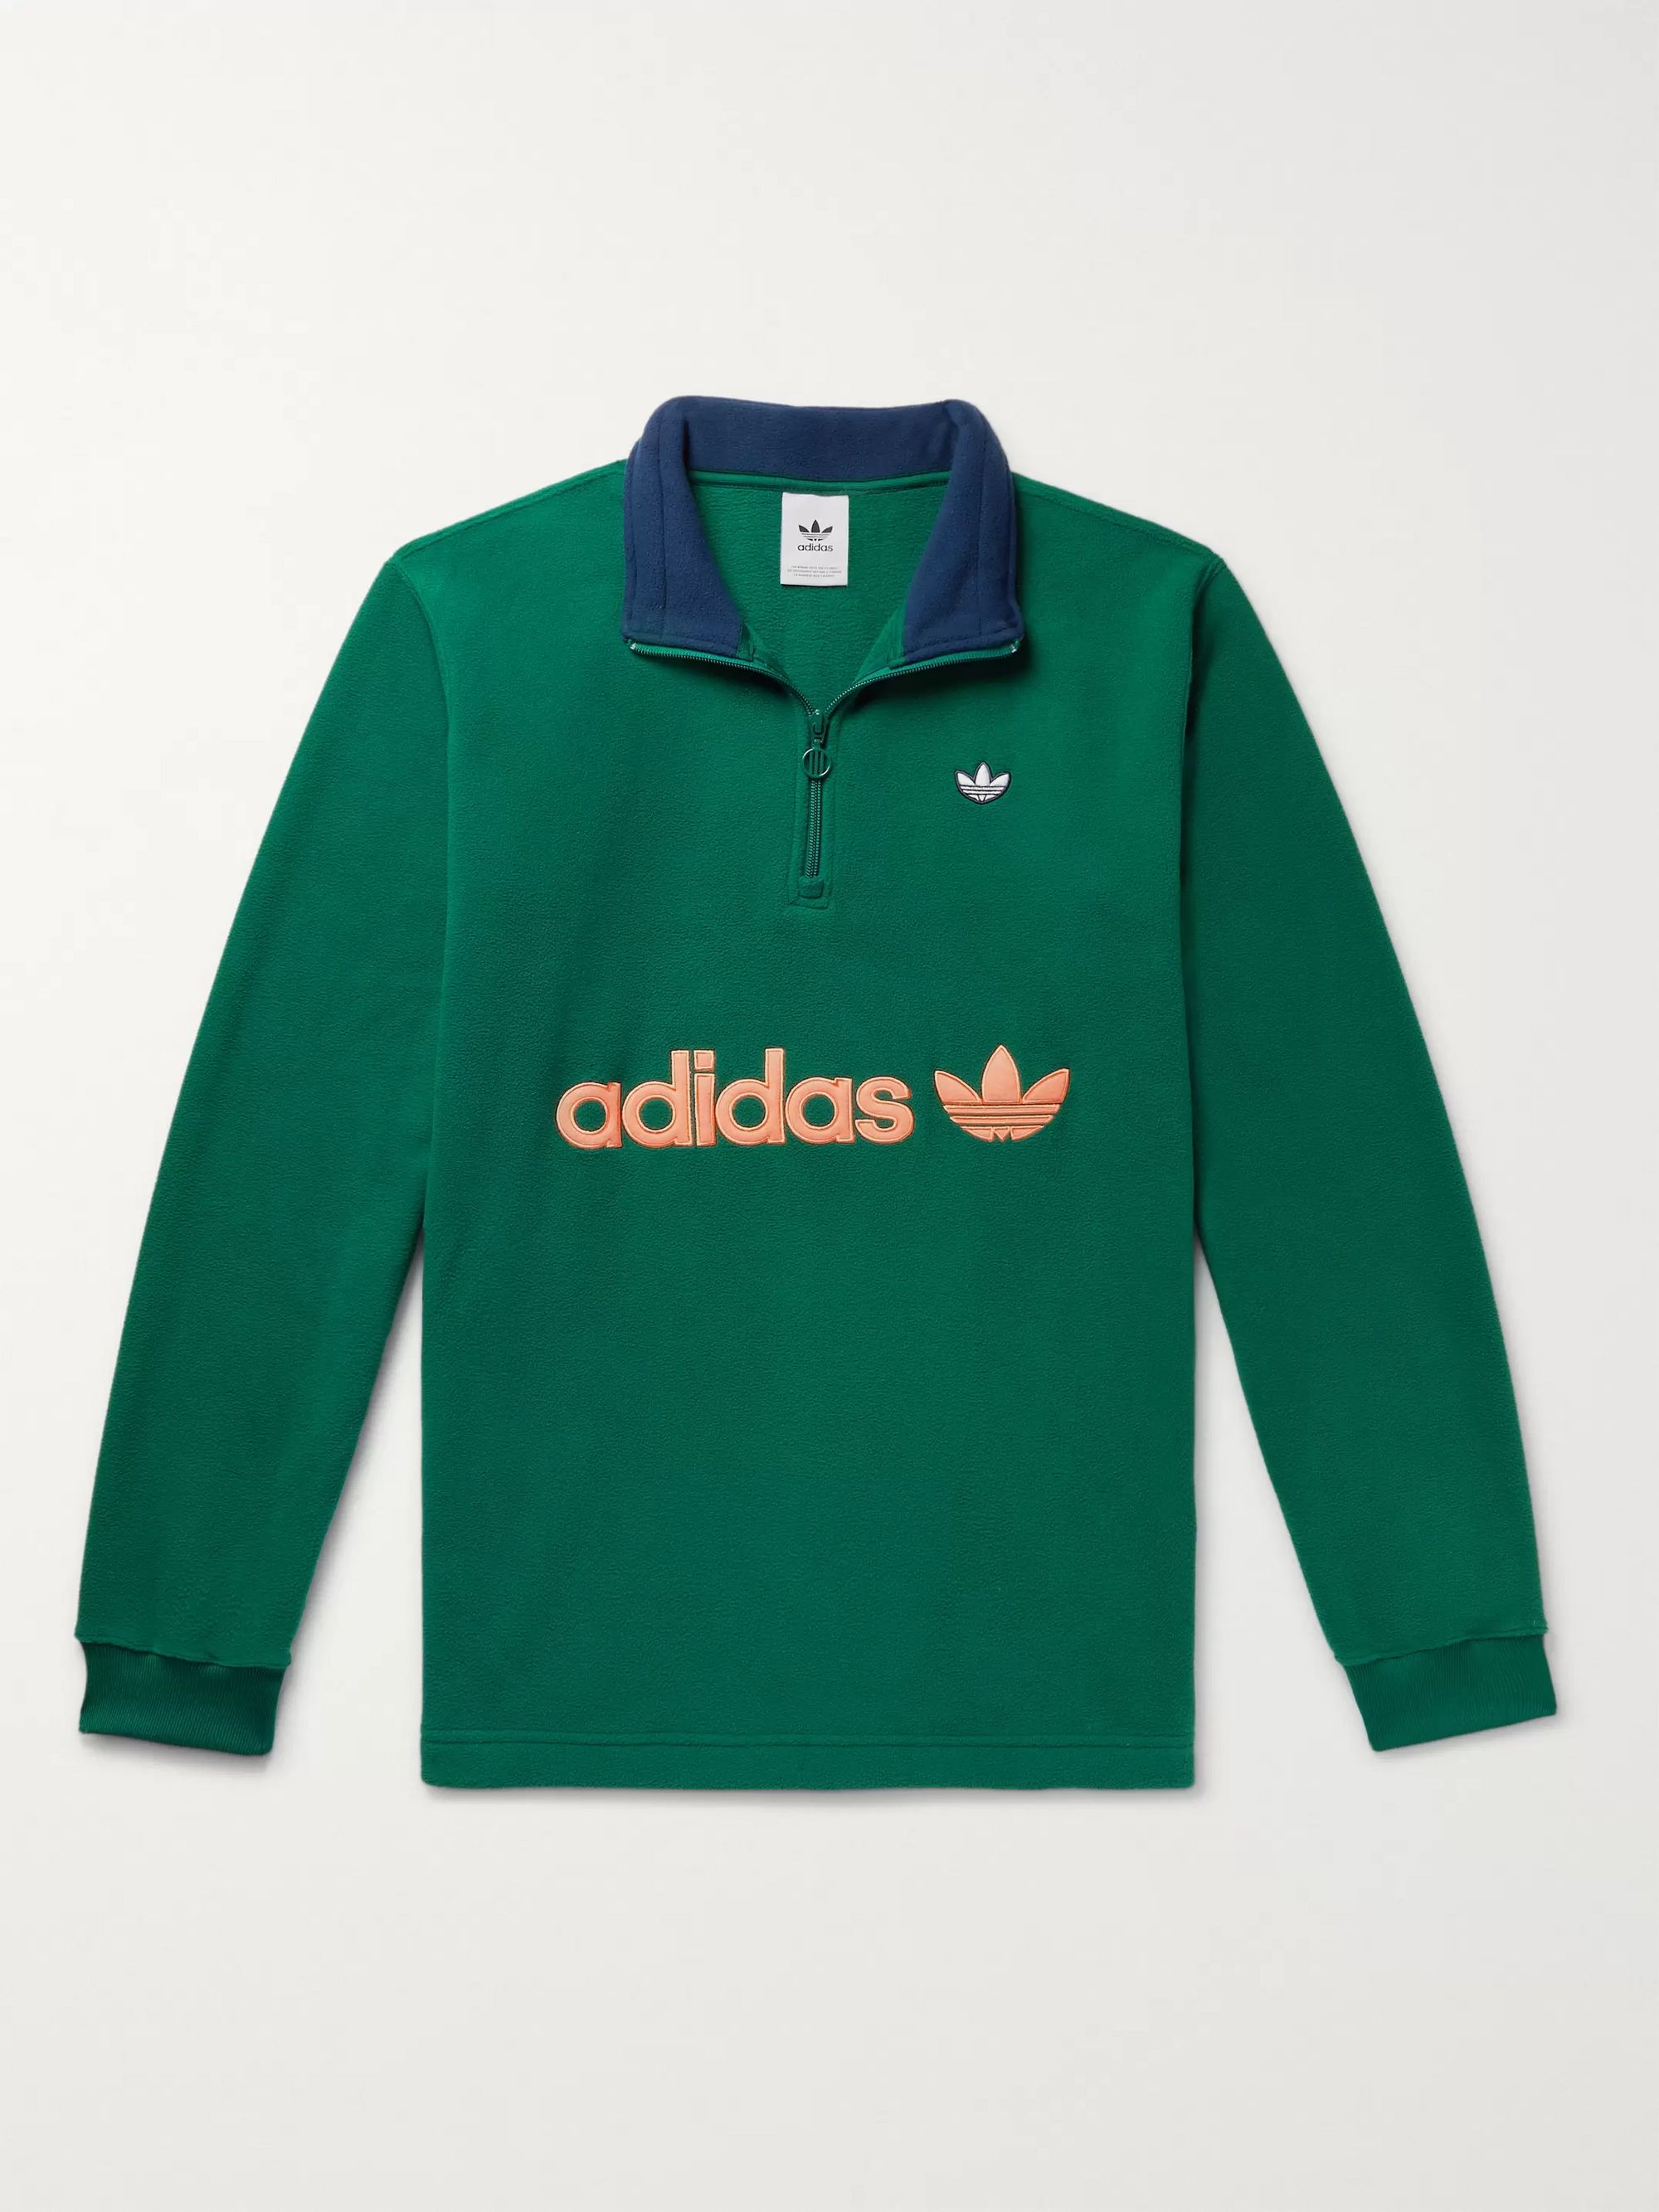 adidas 1/4 zip fleece green